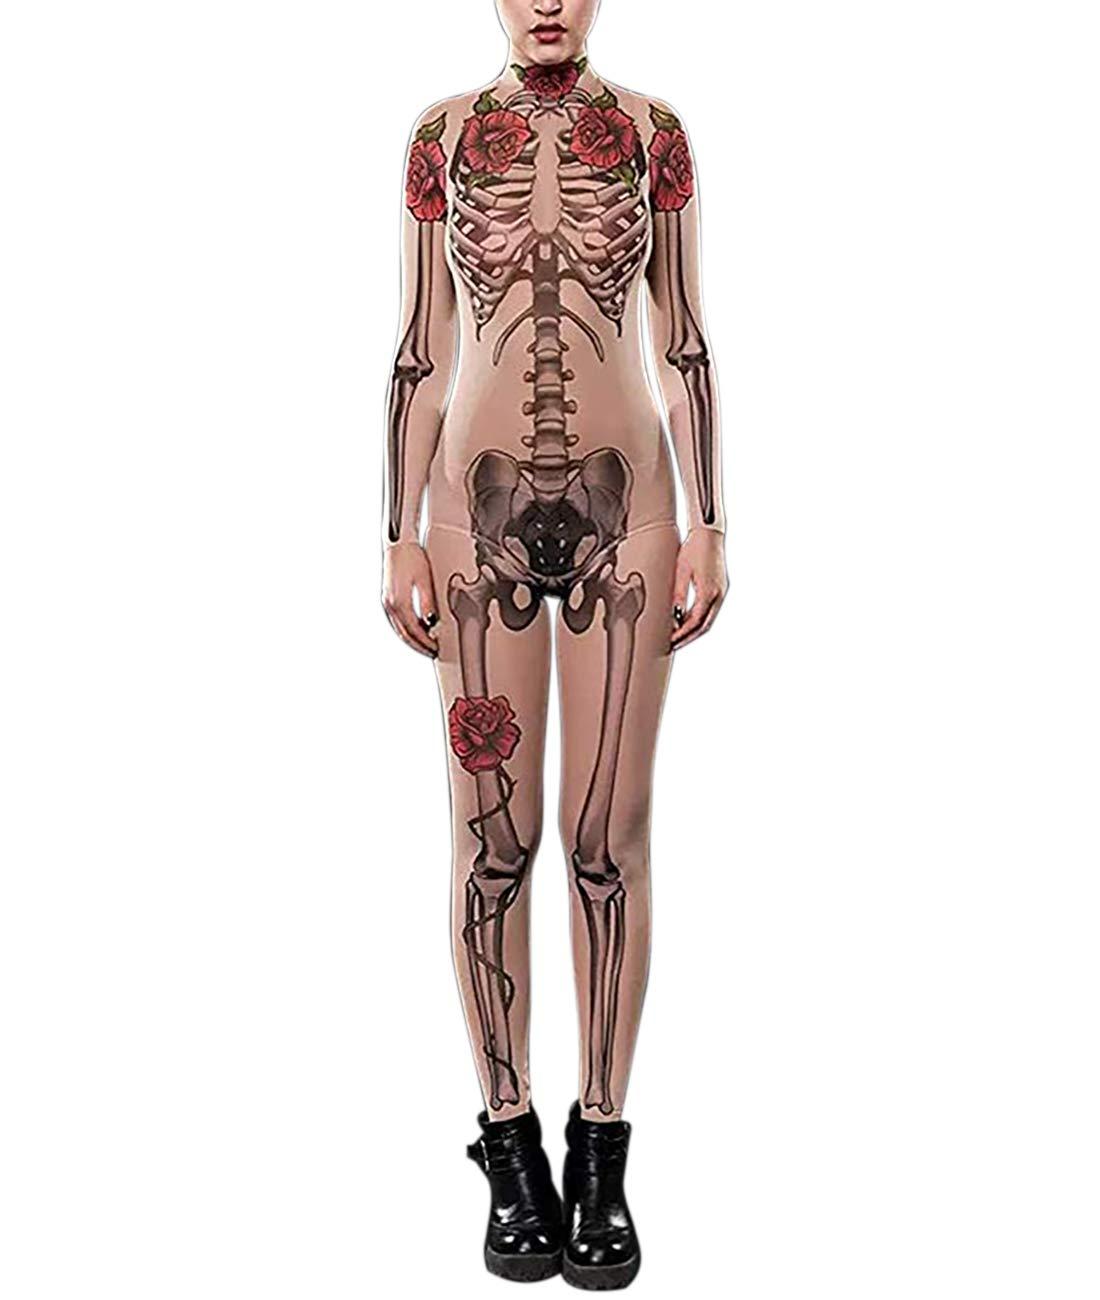 Idgreatim Women Halloween Costume 3d Print Long Sleeve Skinny